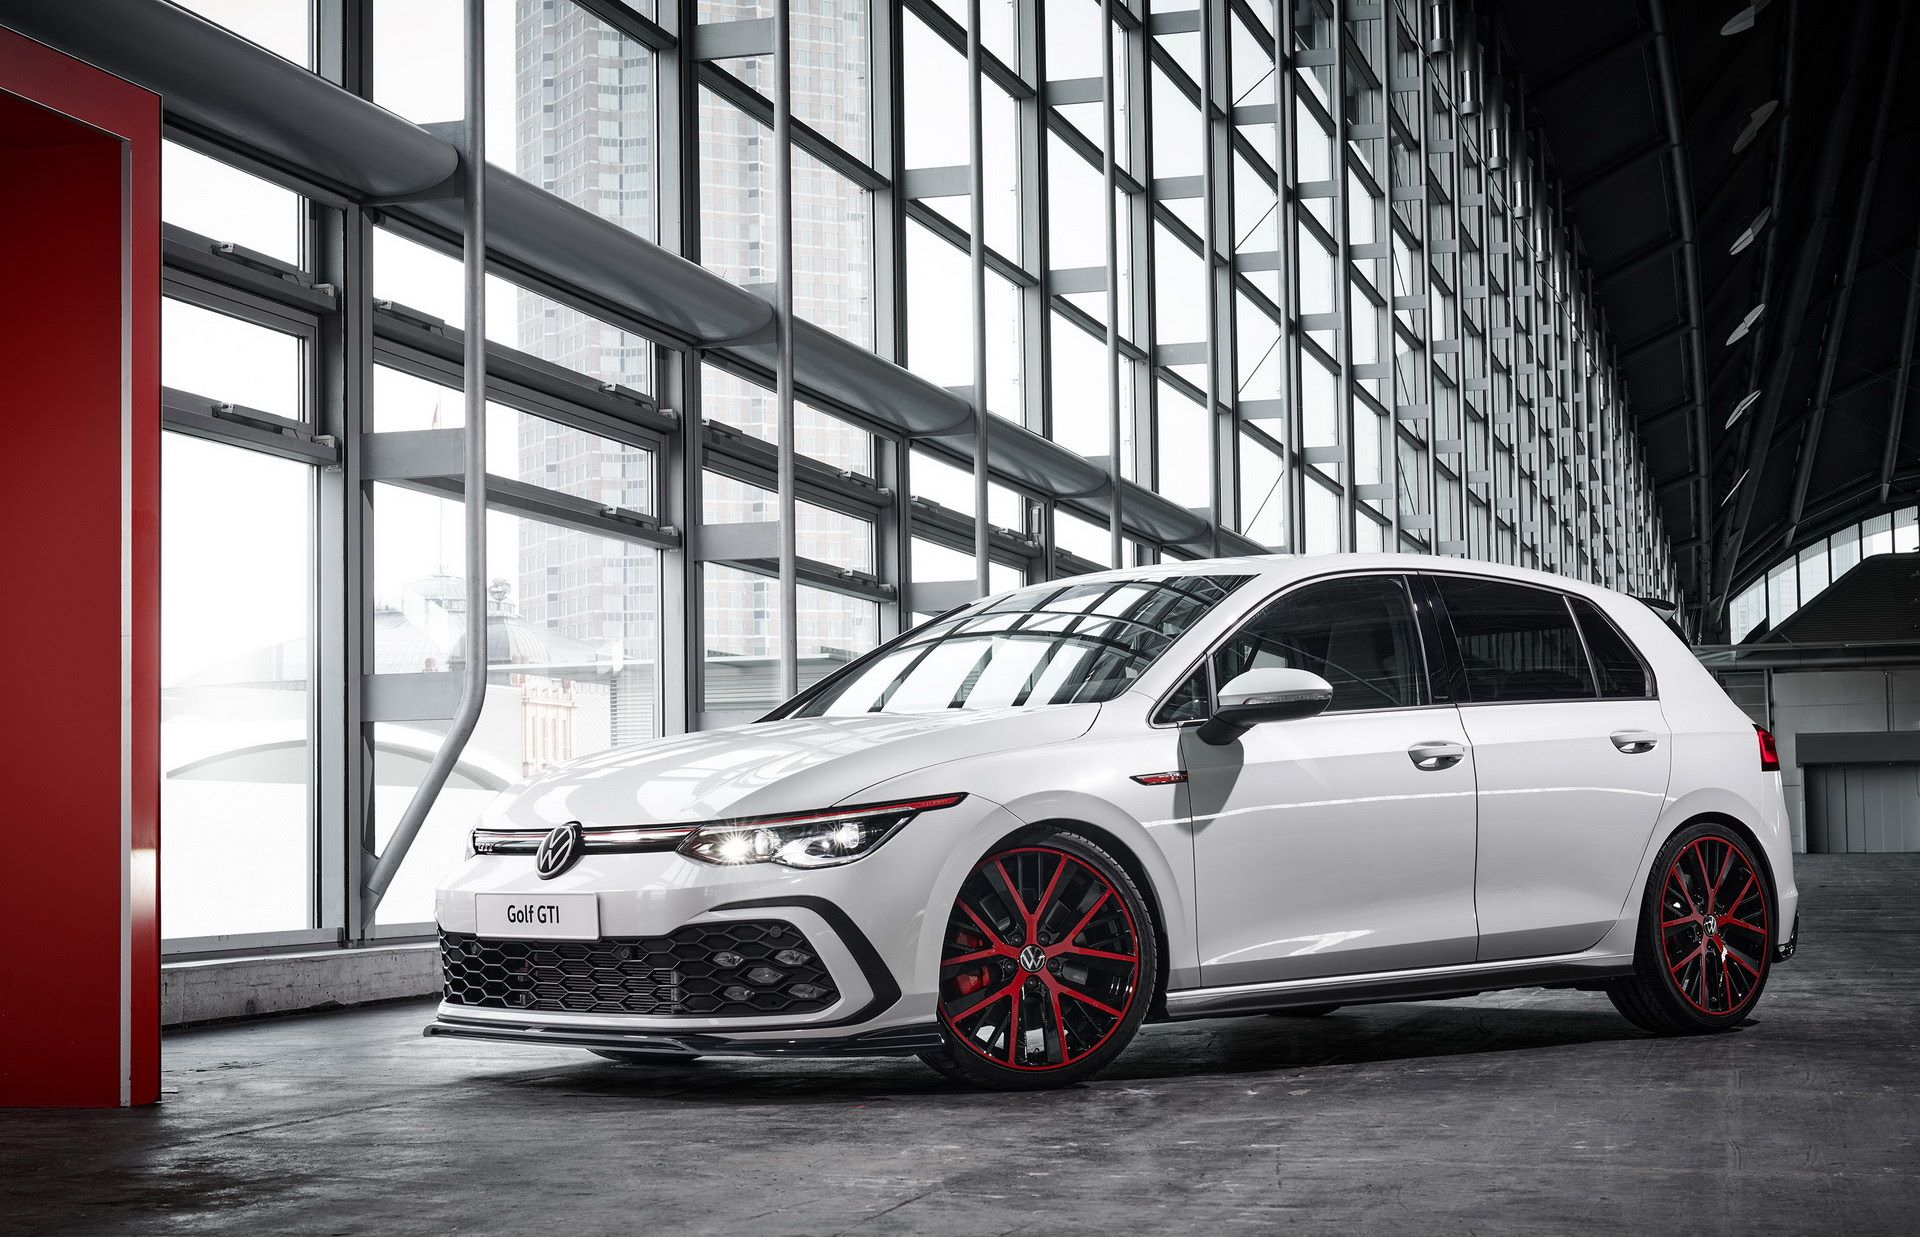 VW-Golf-GTI-By-Oettinger-2